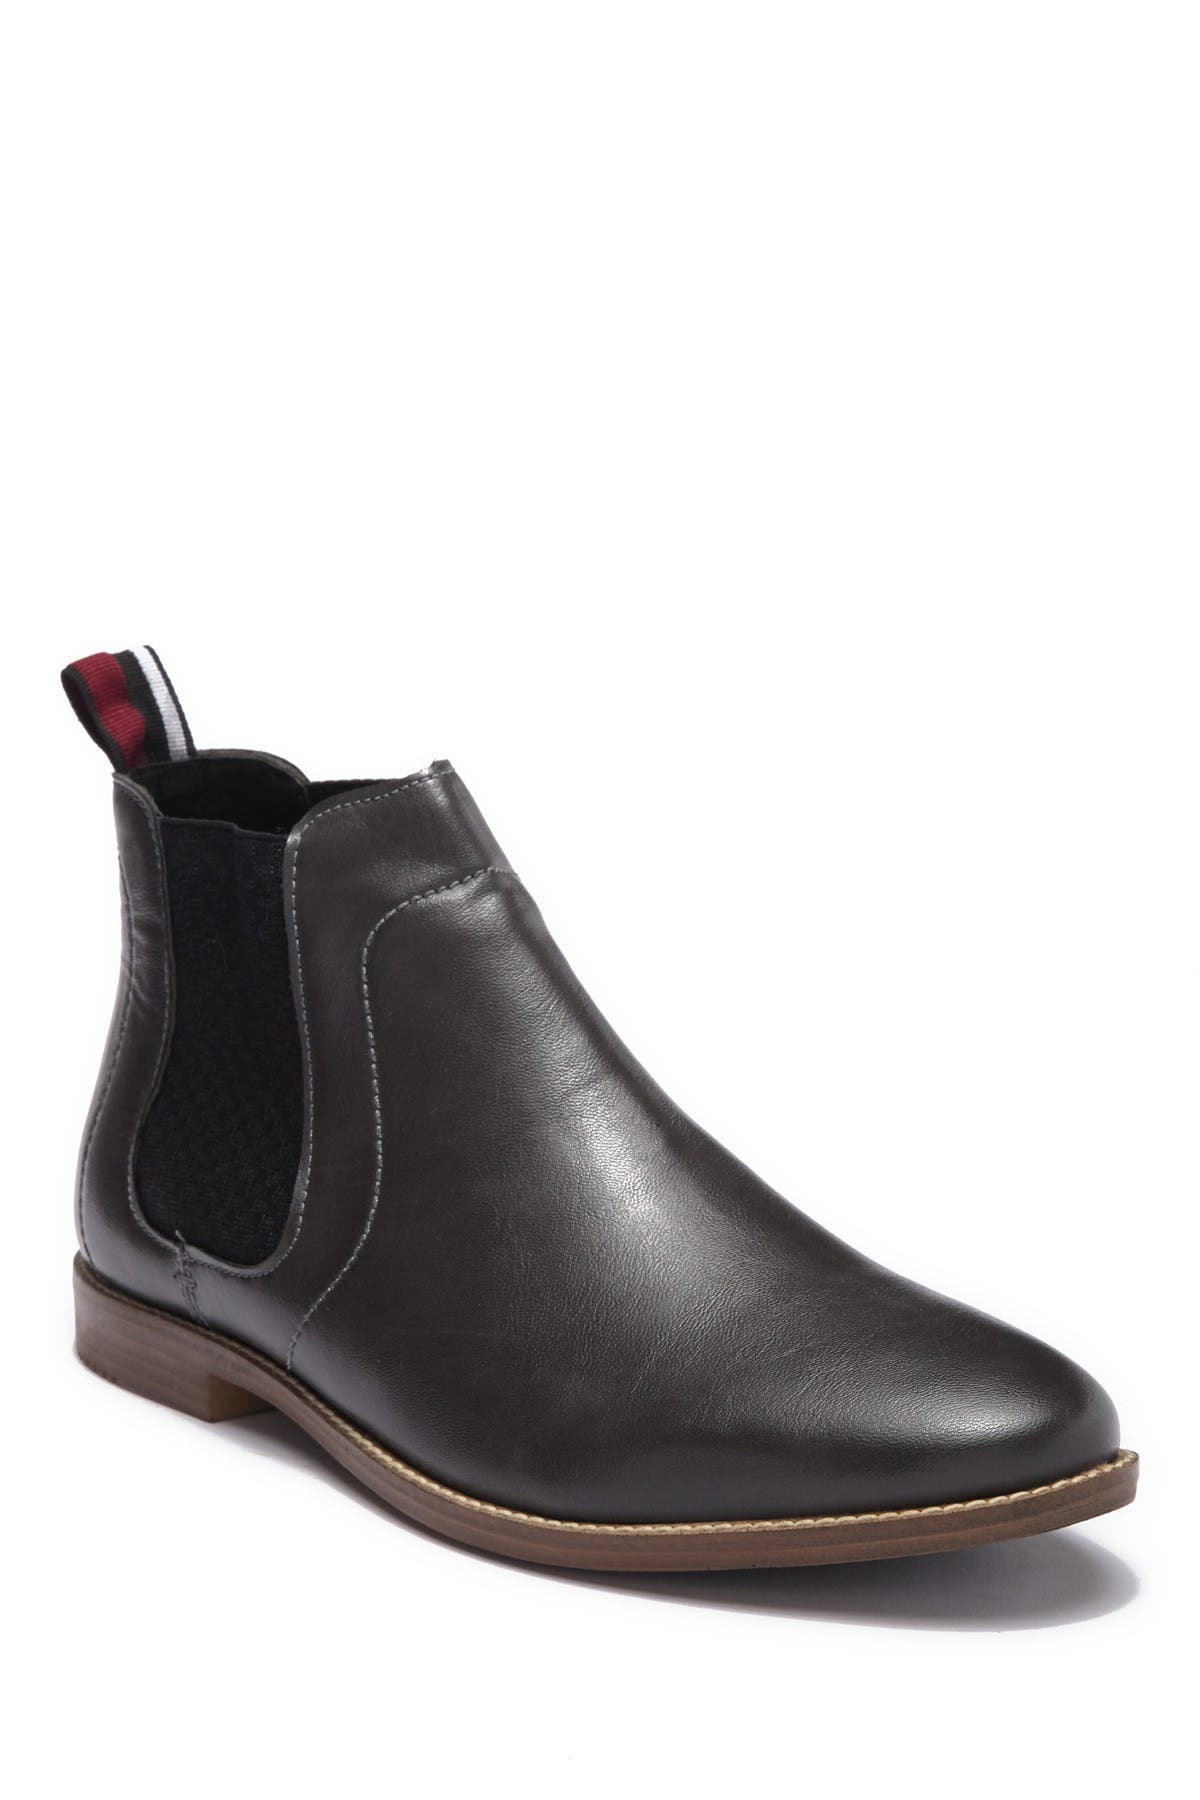 Ben Sherman | Gabe Leather Chelsea Boot